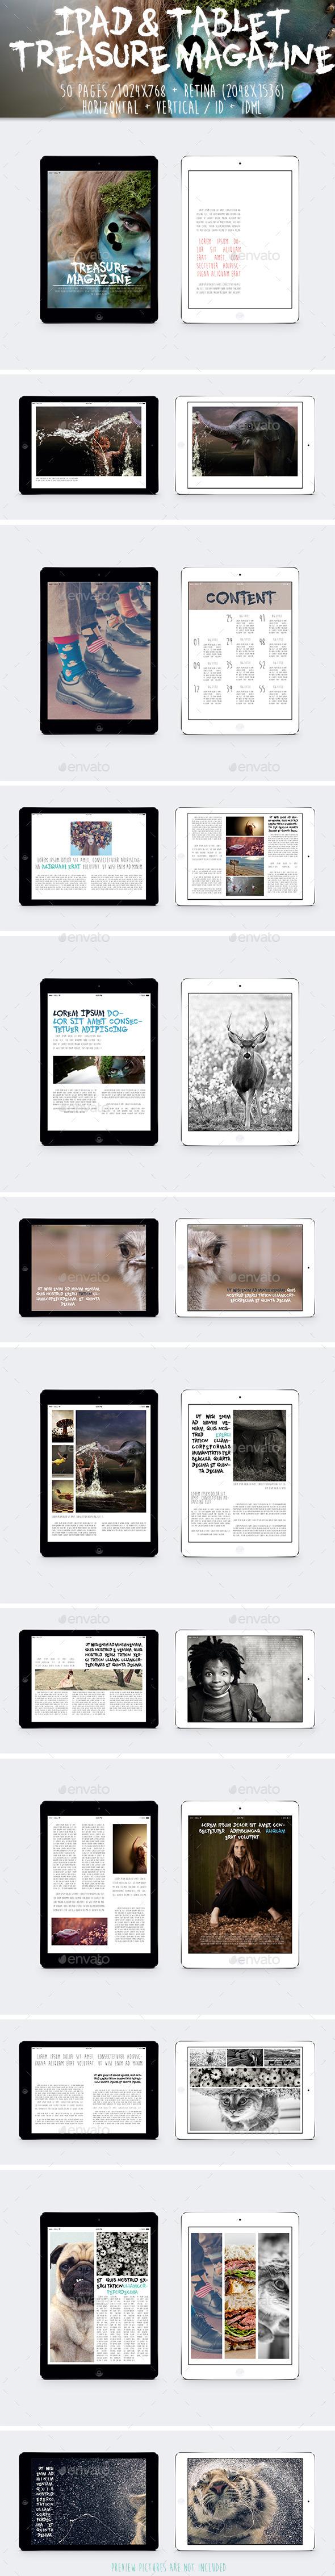 GraphicRiver Ipad & Tablet Treasure Magazine 9904683